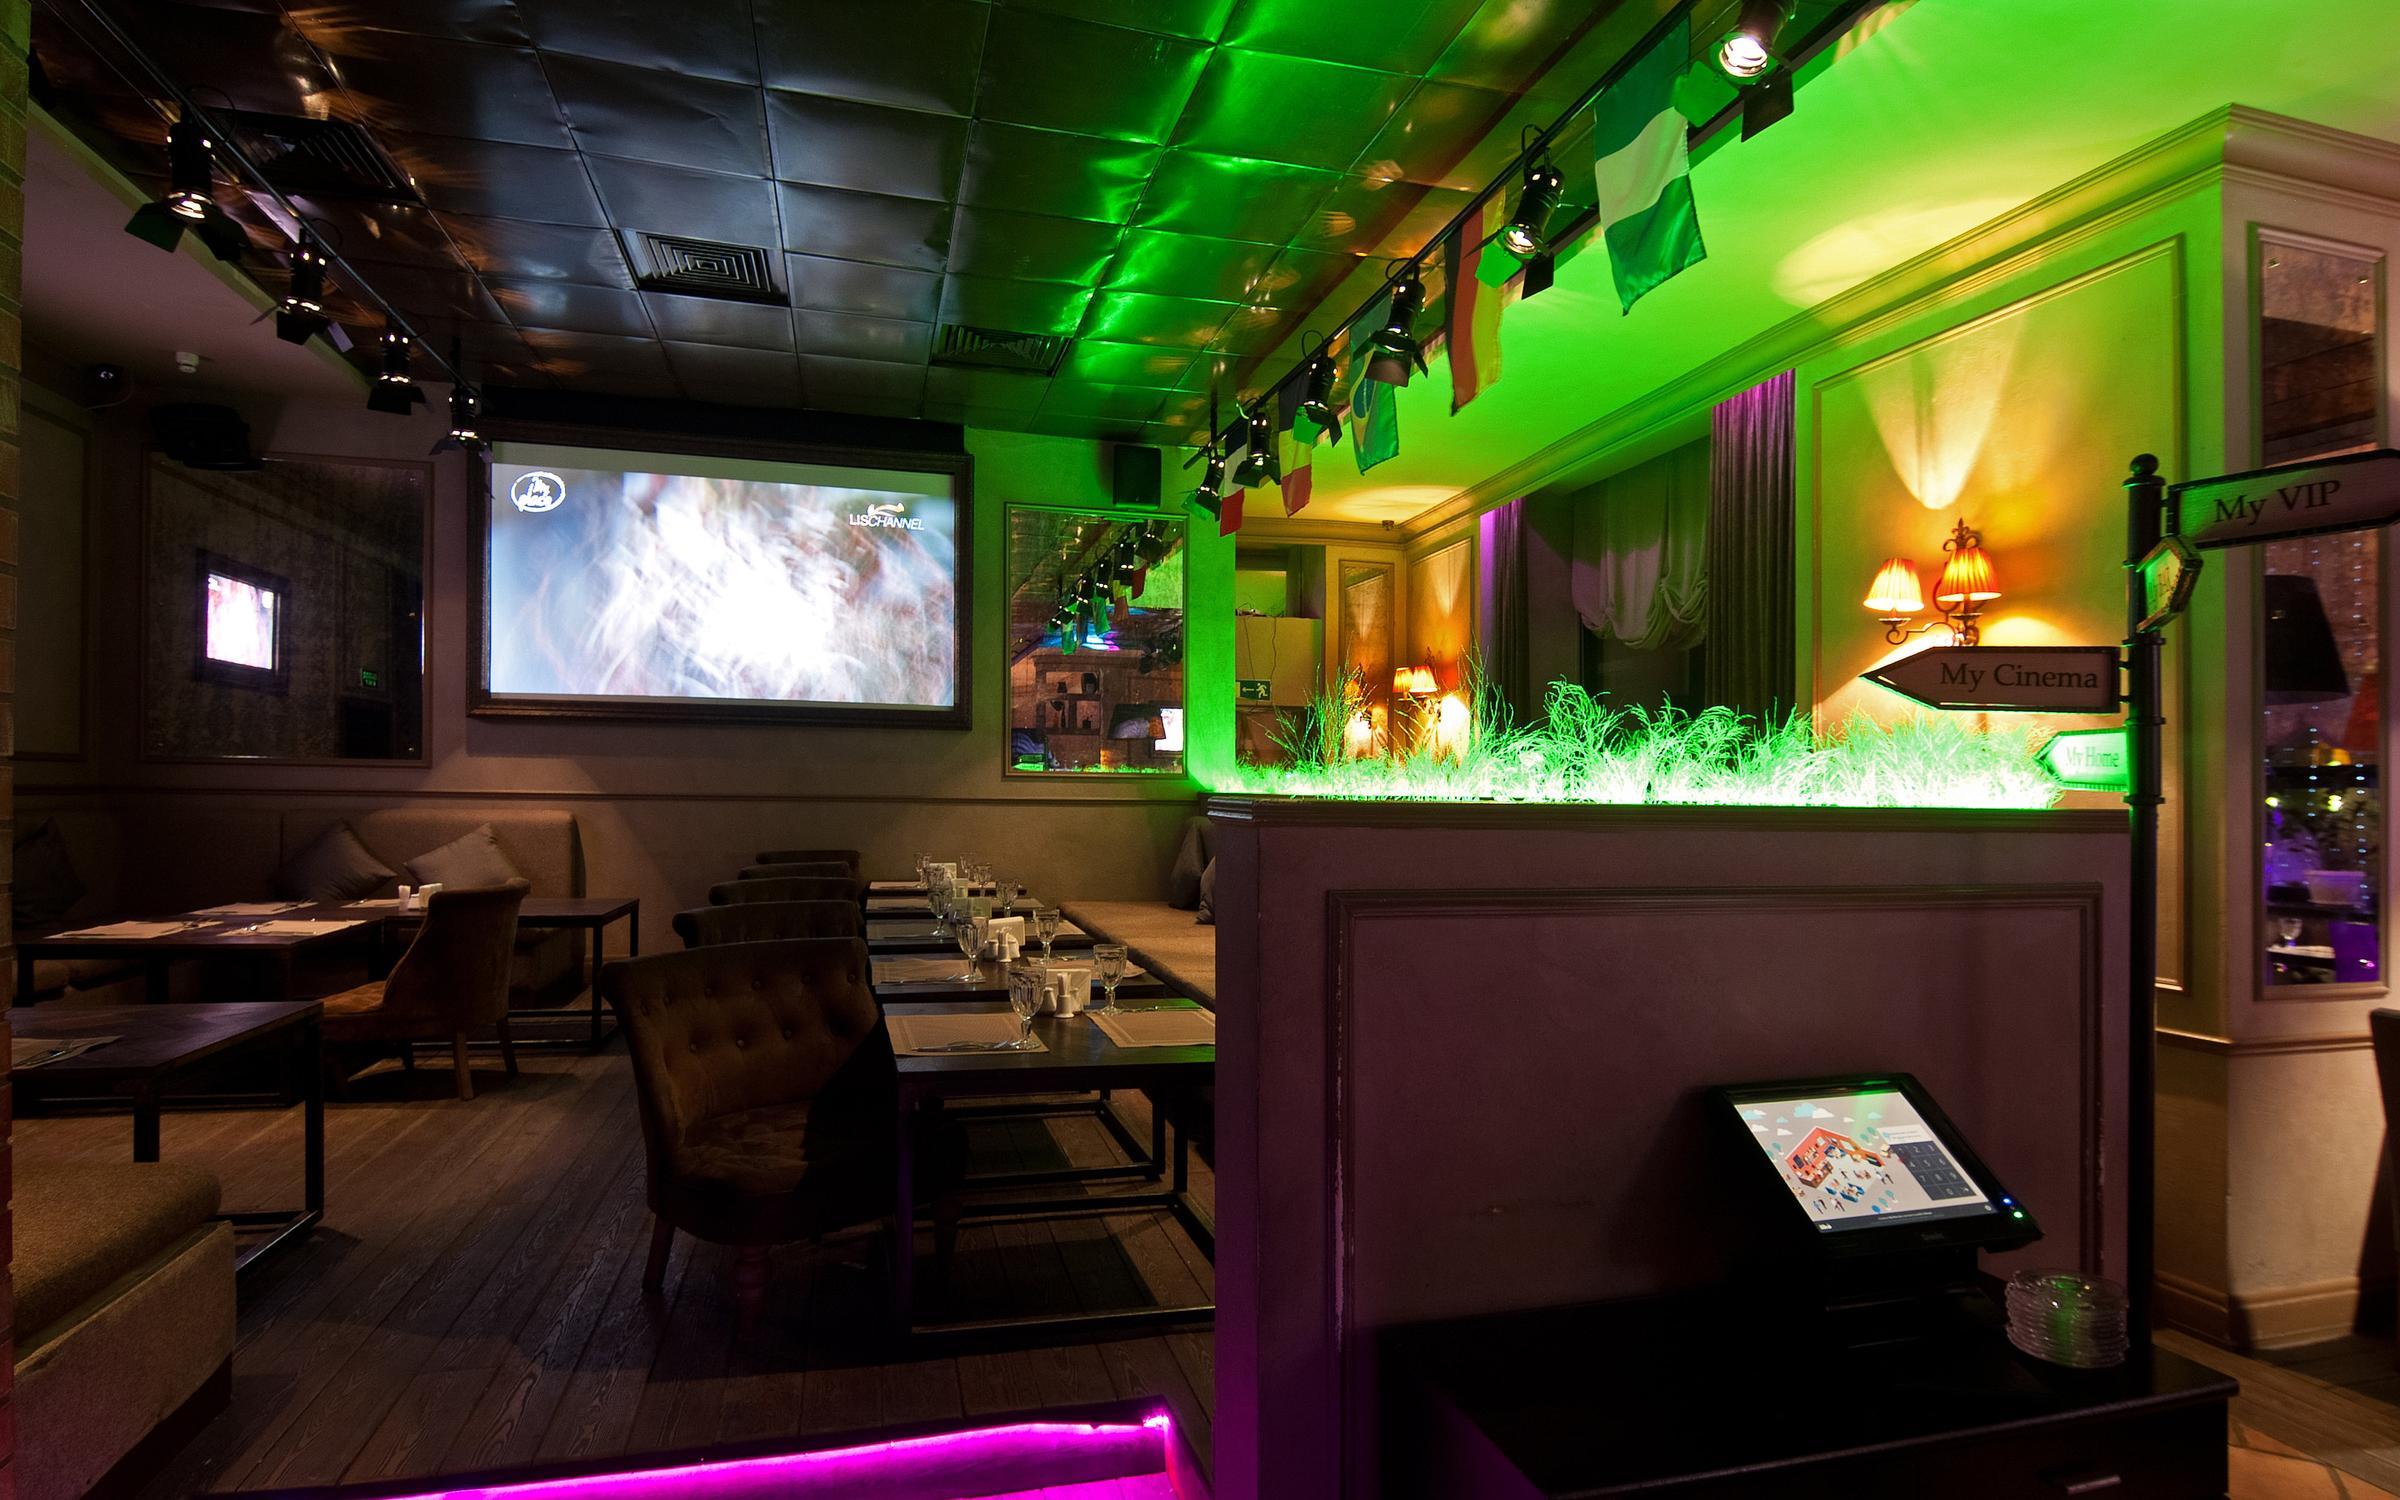 фотография Ресторан Караоке My Place на улице Щепкина